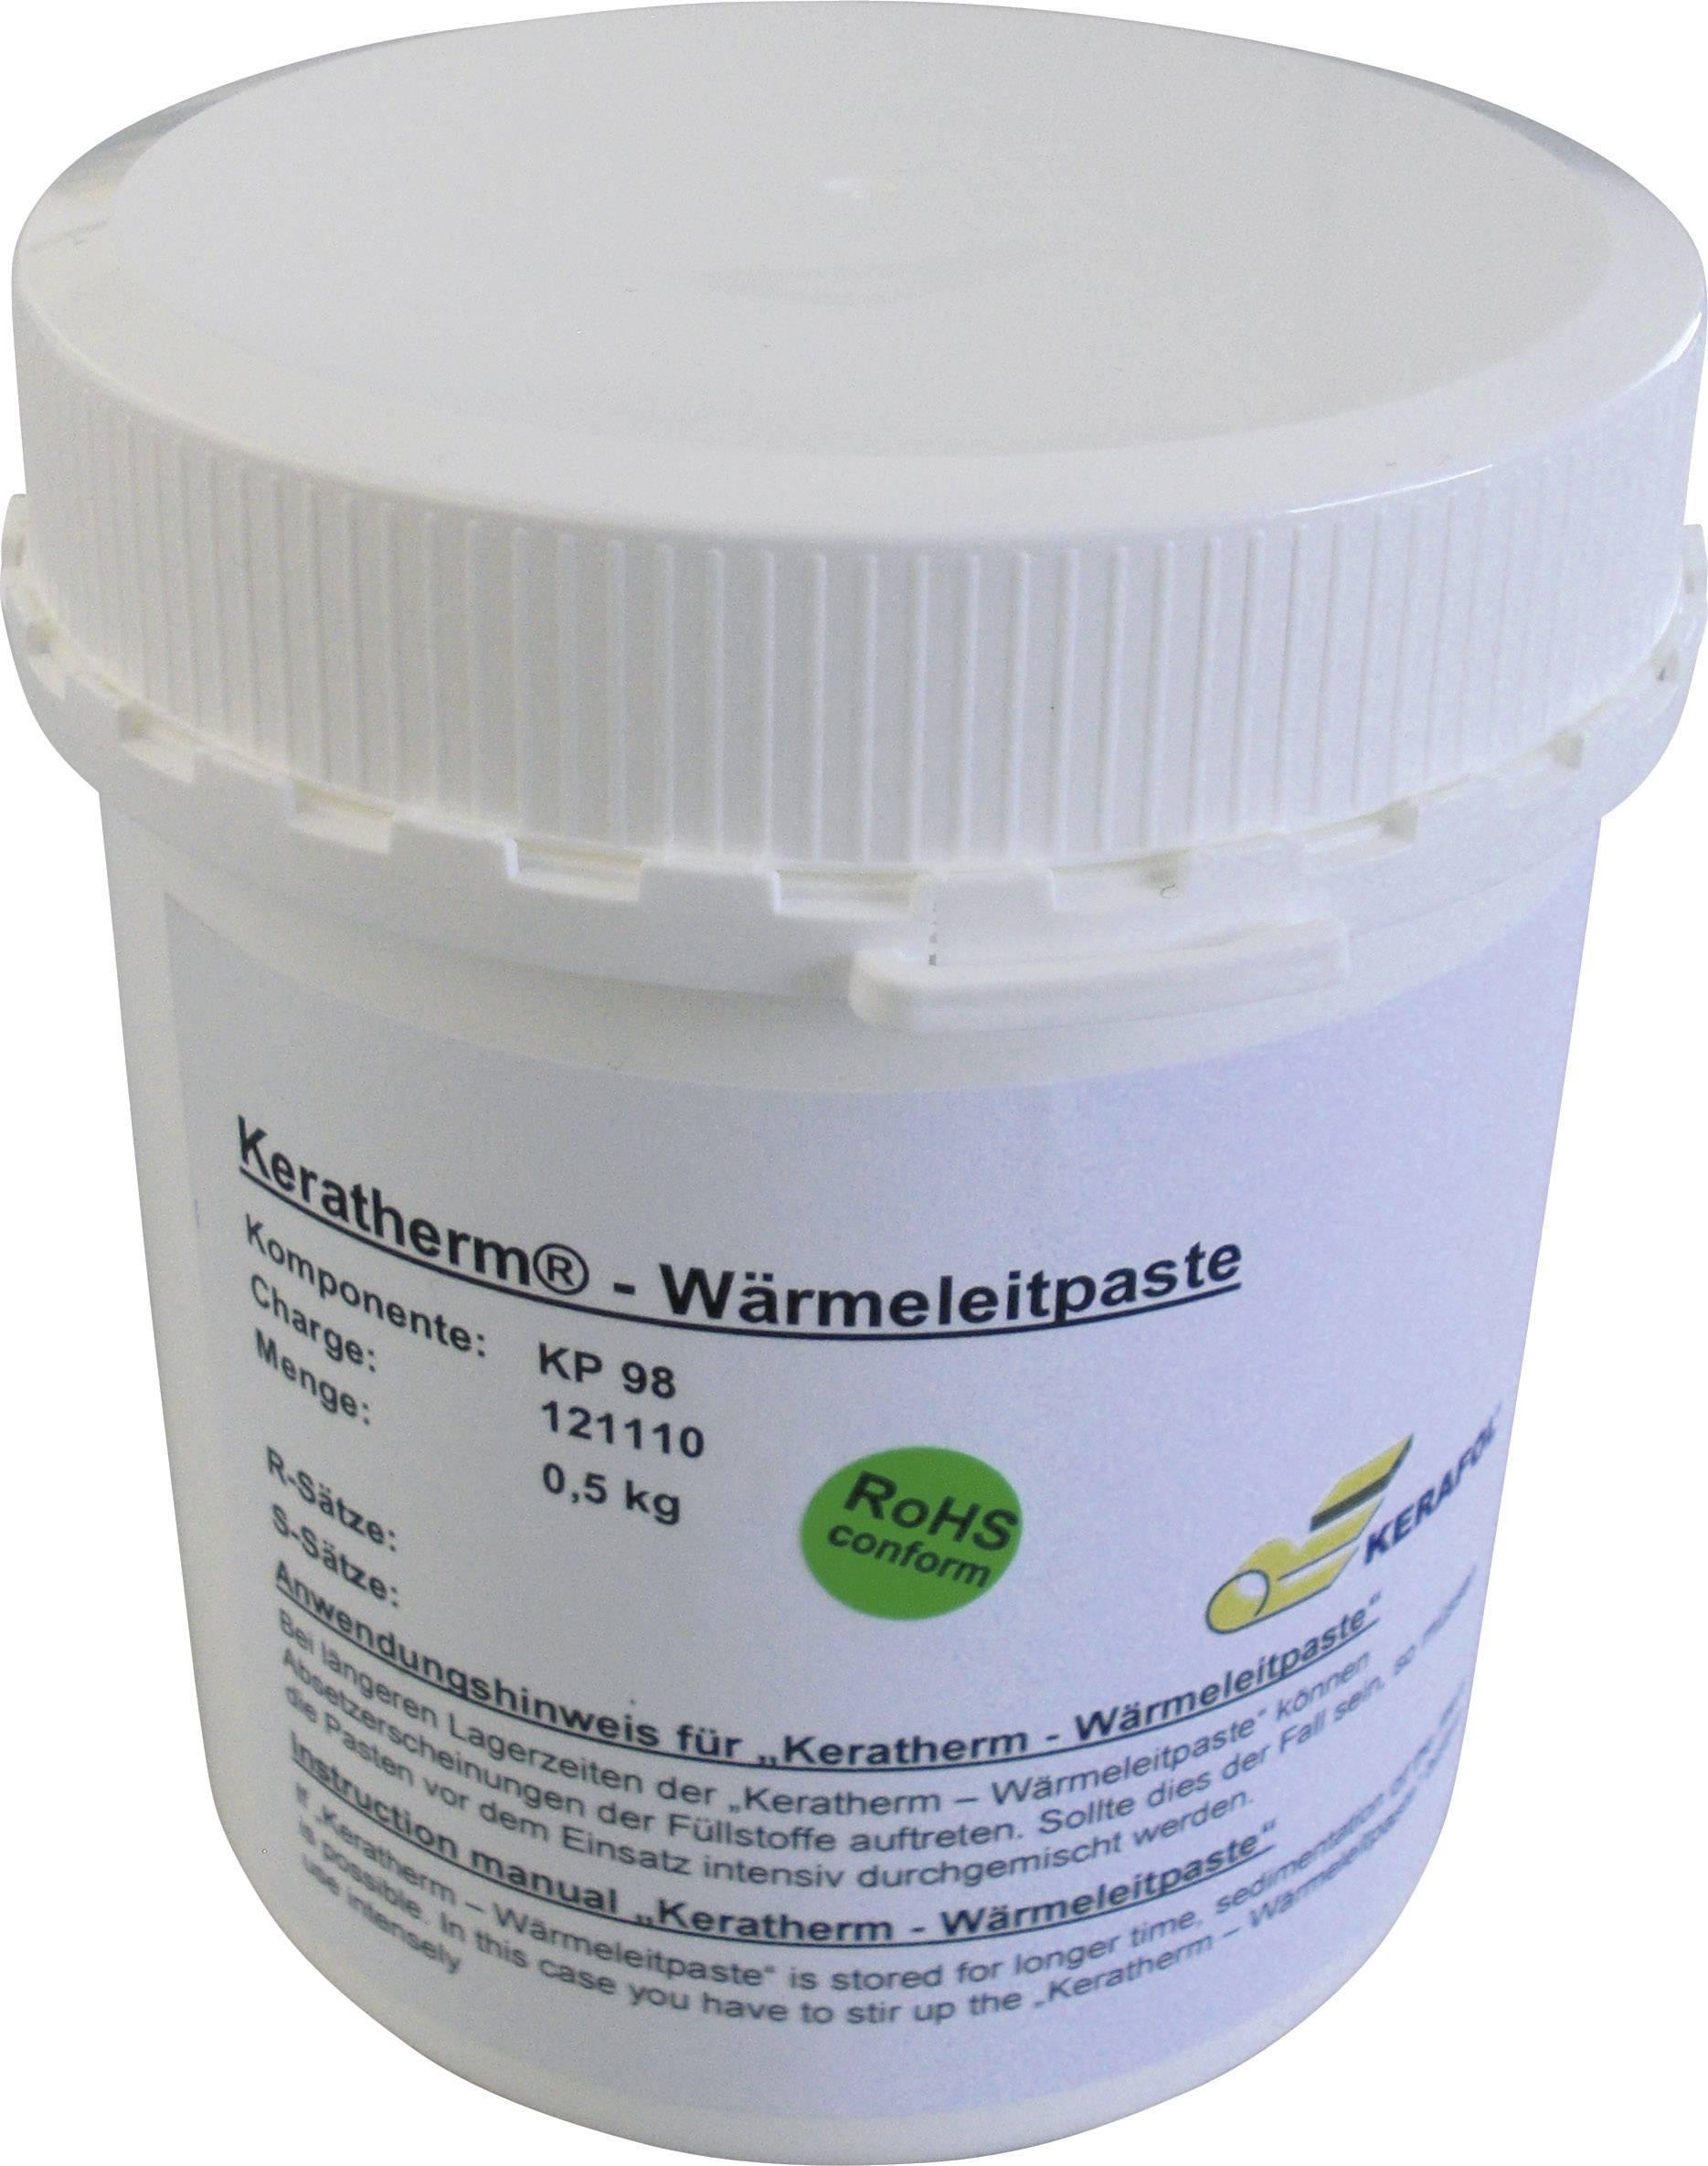 Teplovodivá pasta Kerafol KP98, 6 W/mK, 500 g (228 ml), stříkačka